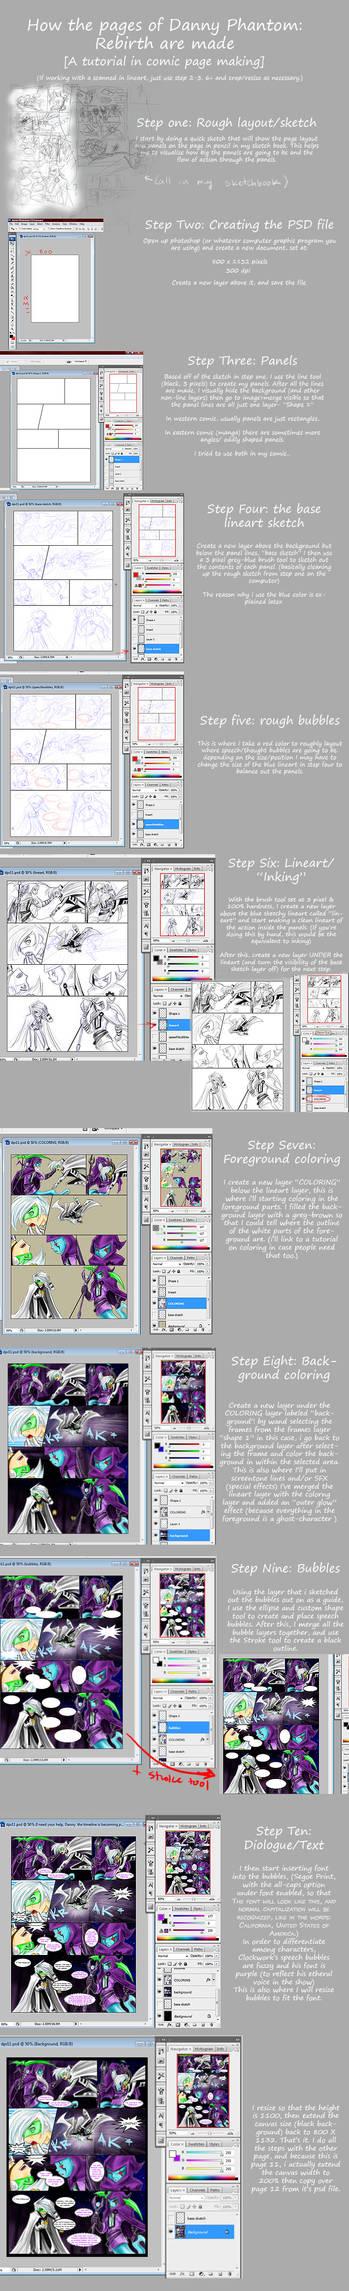 TUT- DP:R comic page making by slifertheskydragon